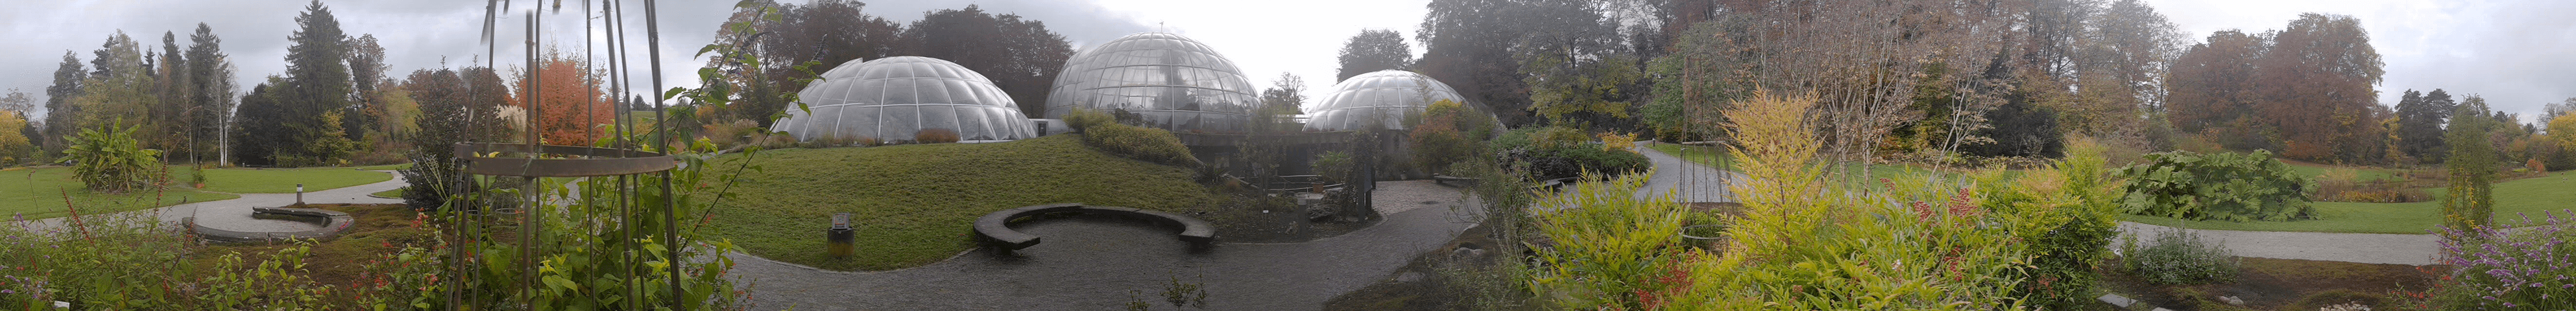 Jardín Botánico de Zurich